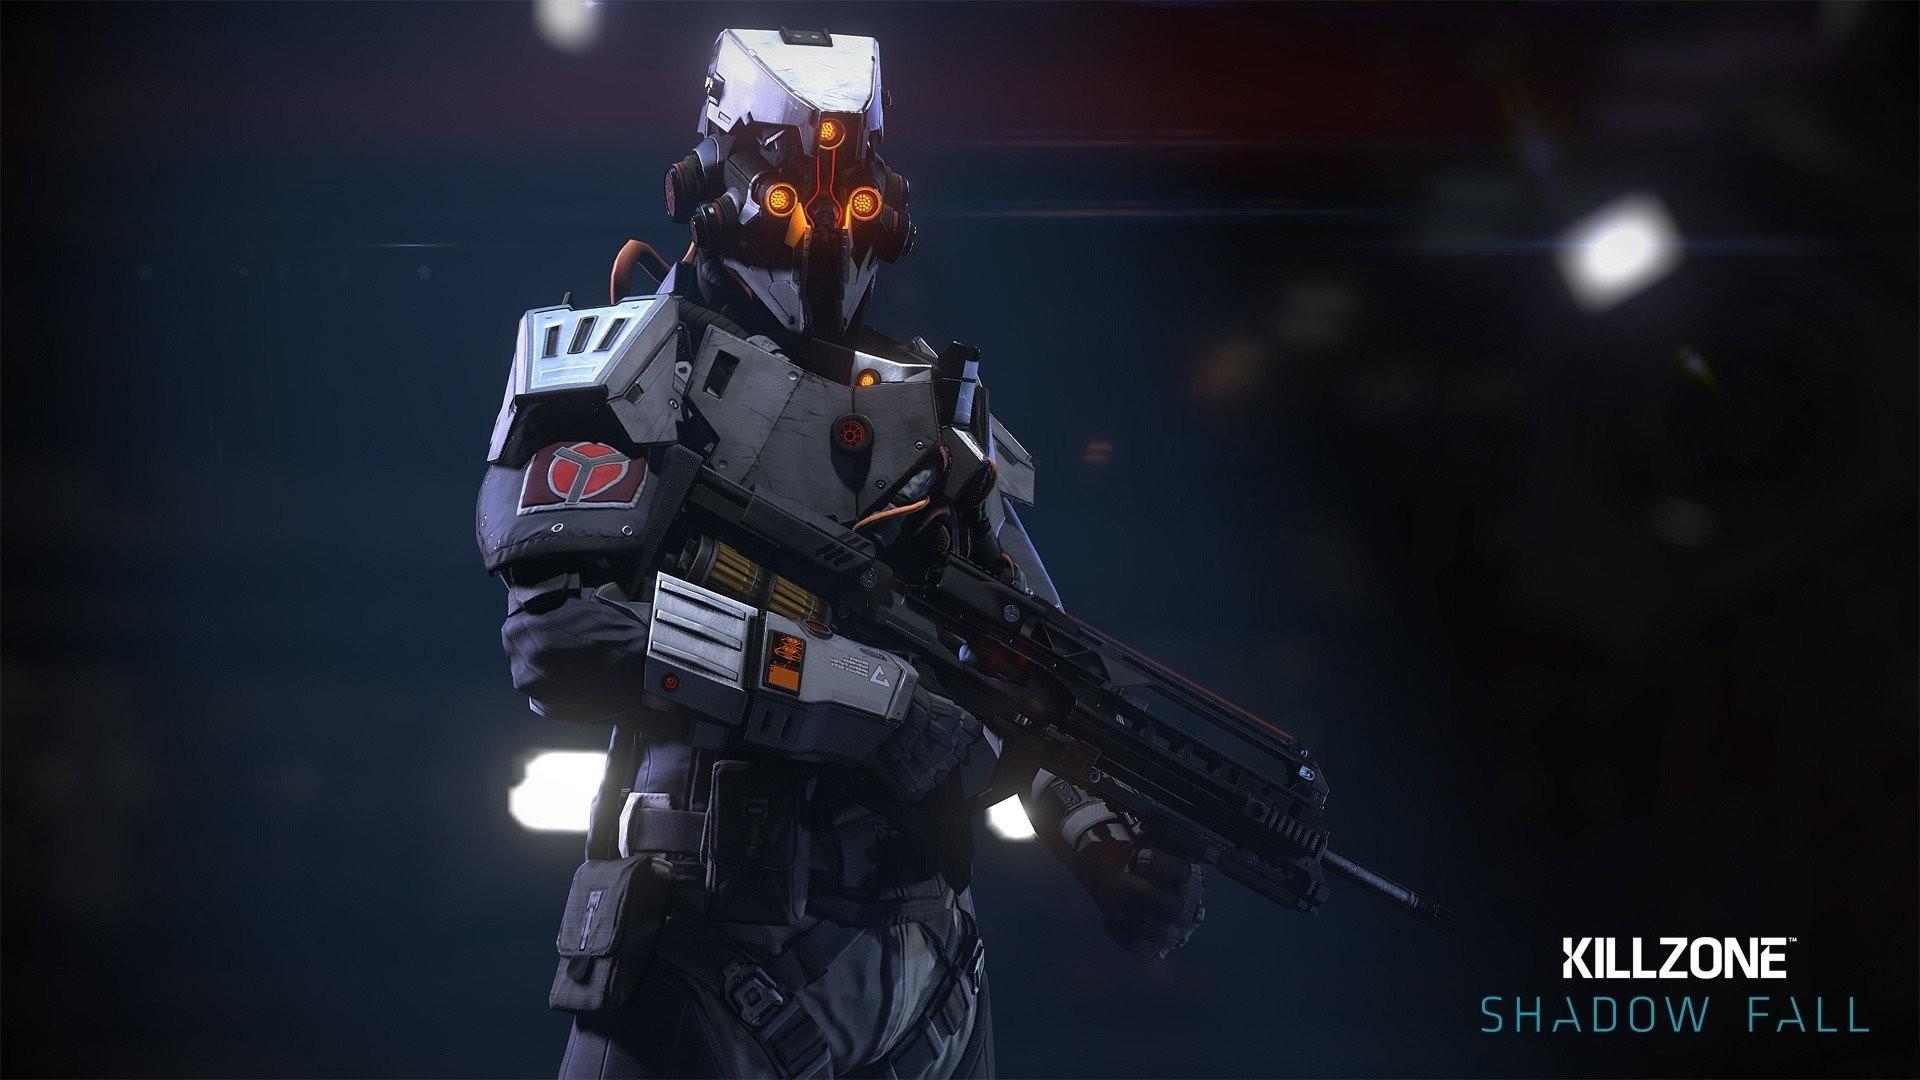 Video Game – Killzone: Shadow Fall Wallpaper